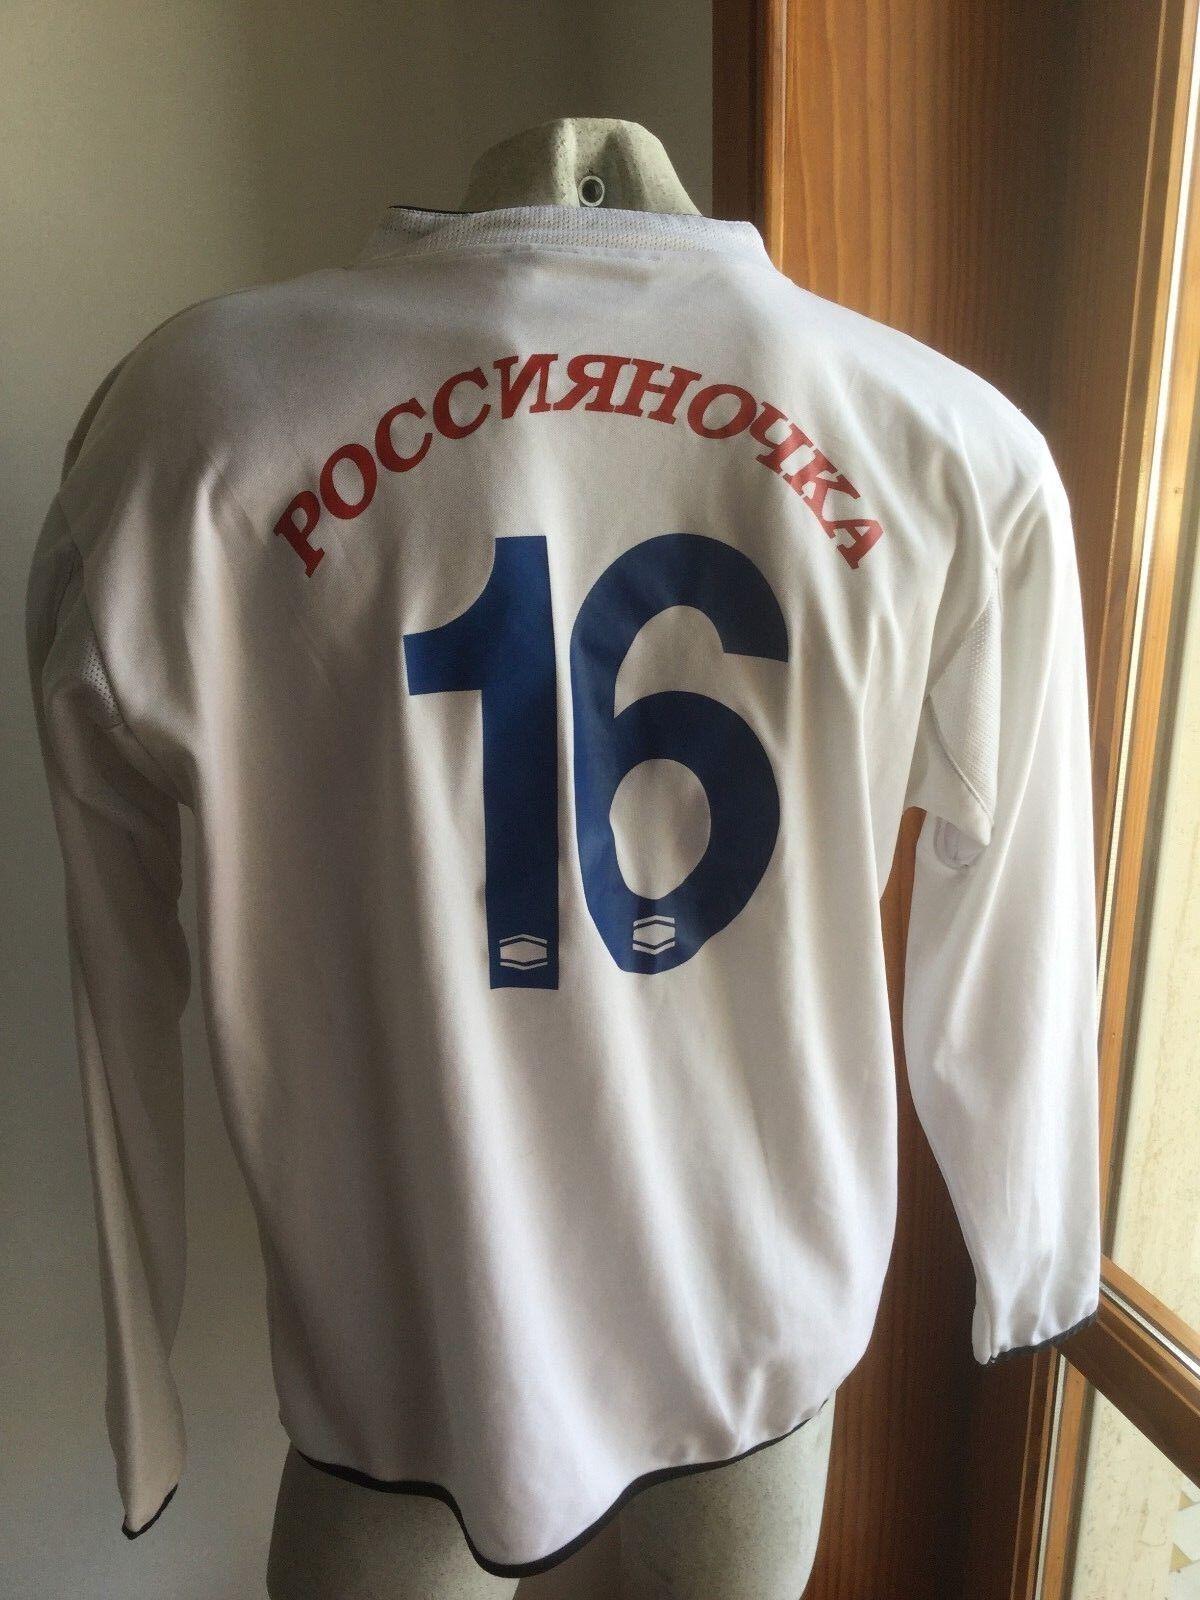 Maglia GARMAN calcio russia UKRAINE 16trikot football shirt jersey